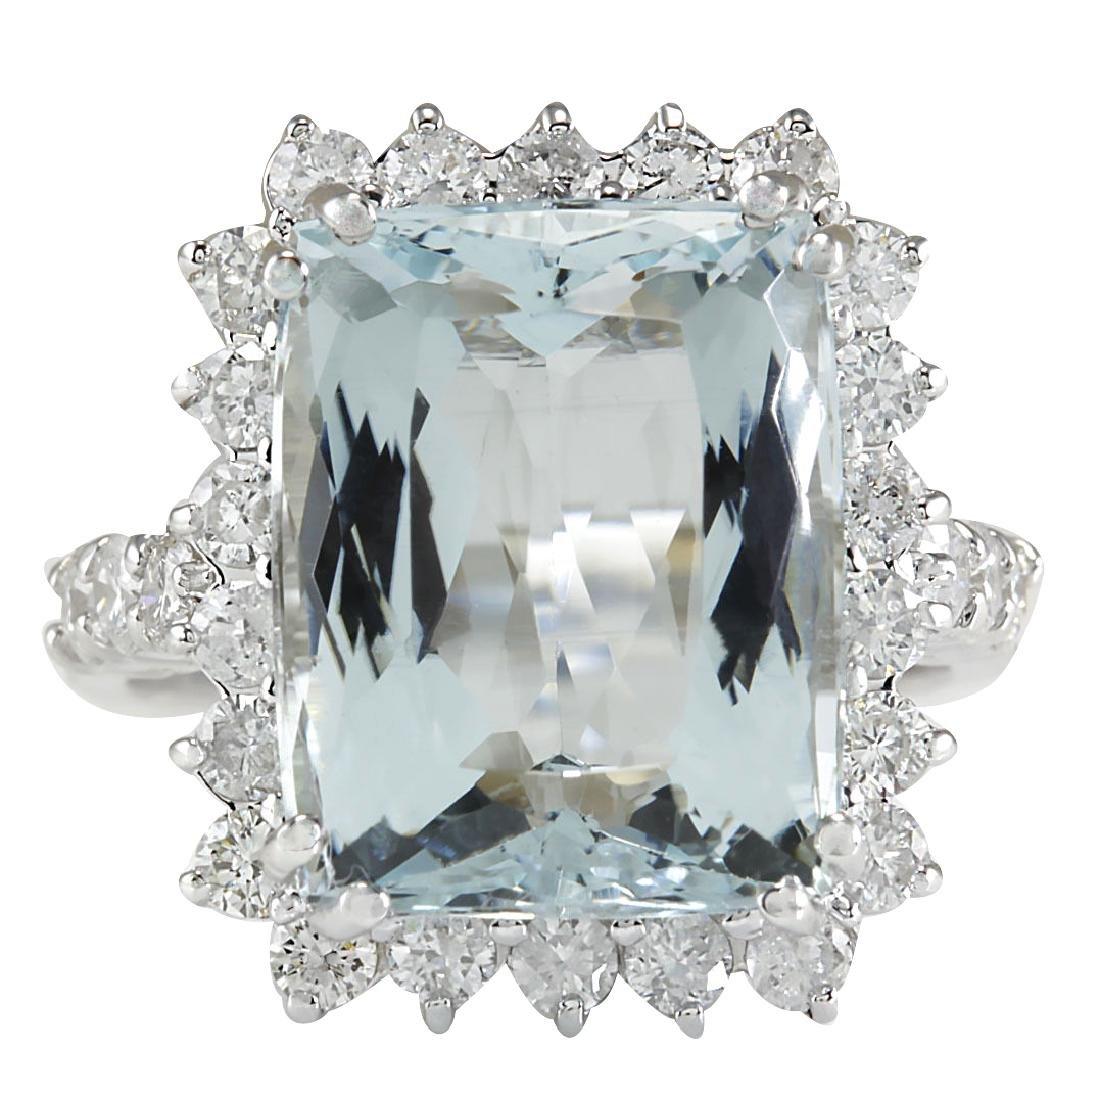 10.55CTW Natural Aquamarine And Diamond Ring In 18K